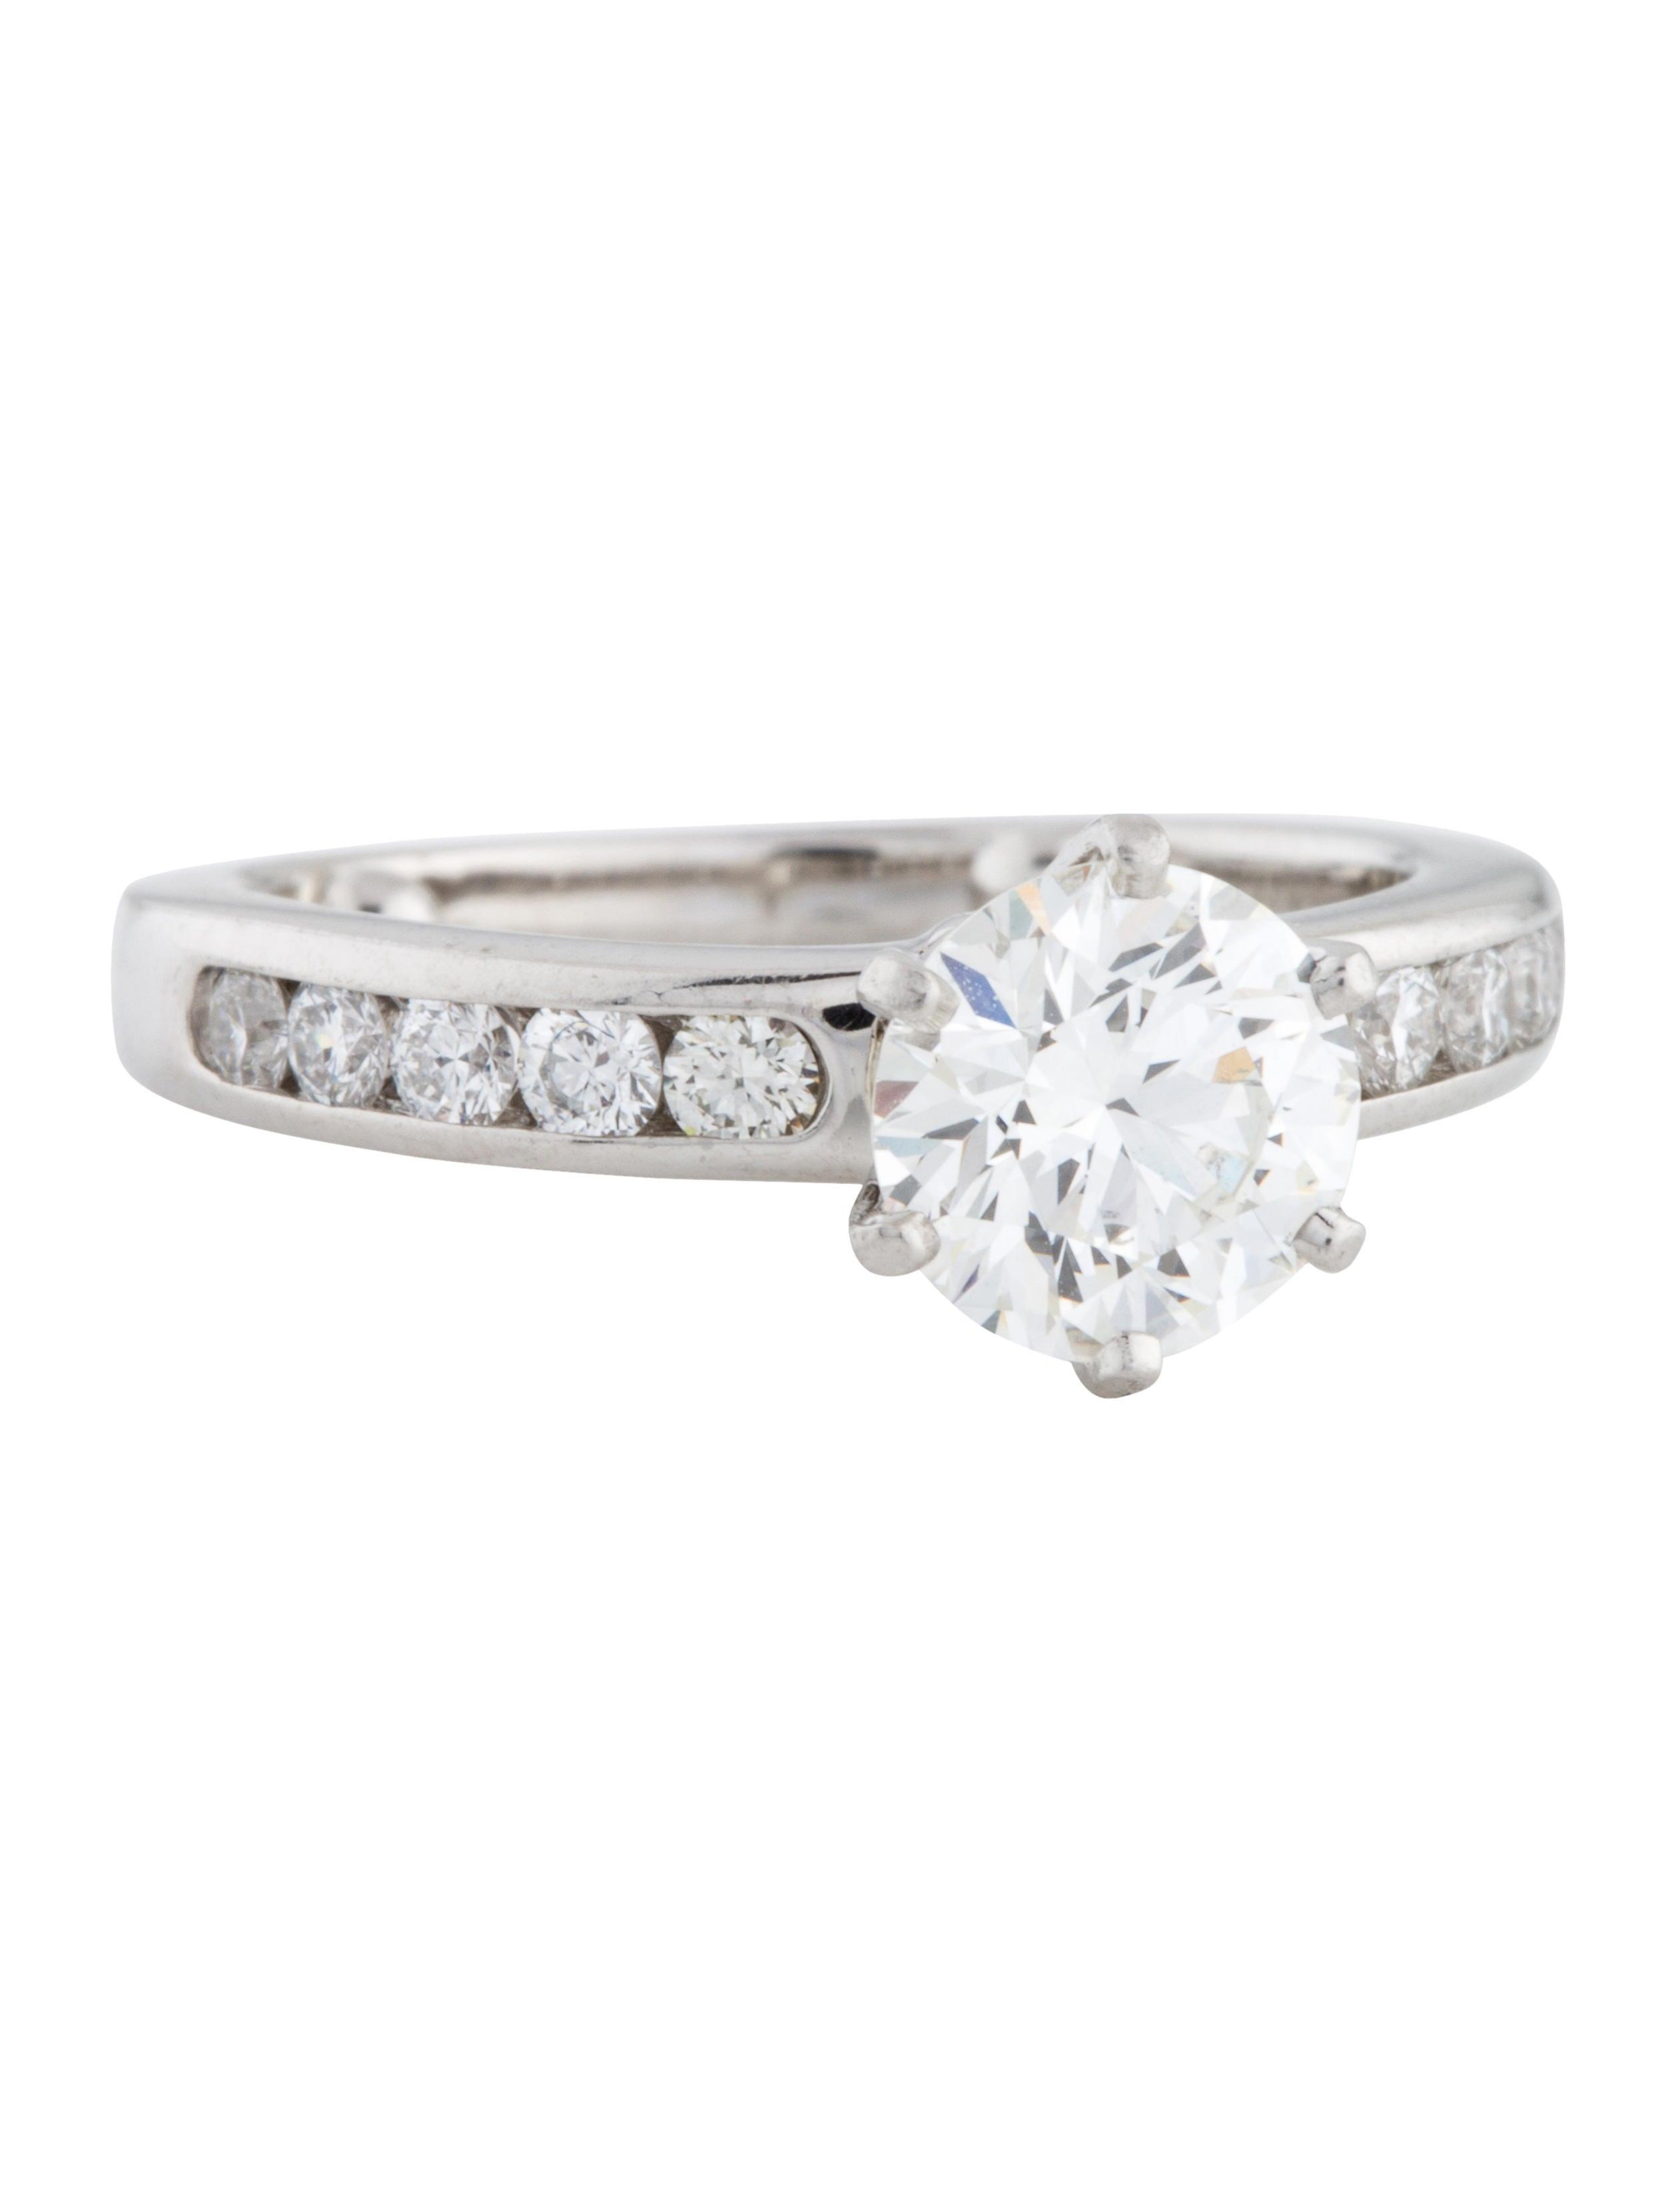 Tiffany Co Platinum The Tiffany Setting Engagement Ring Rings